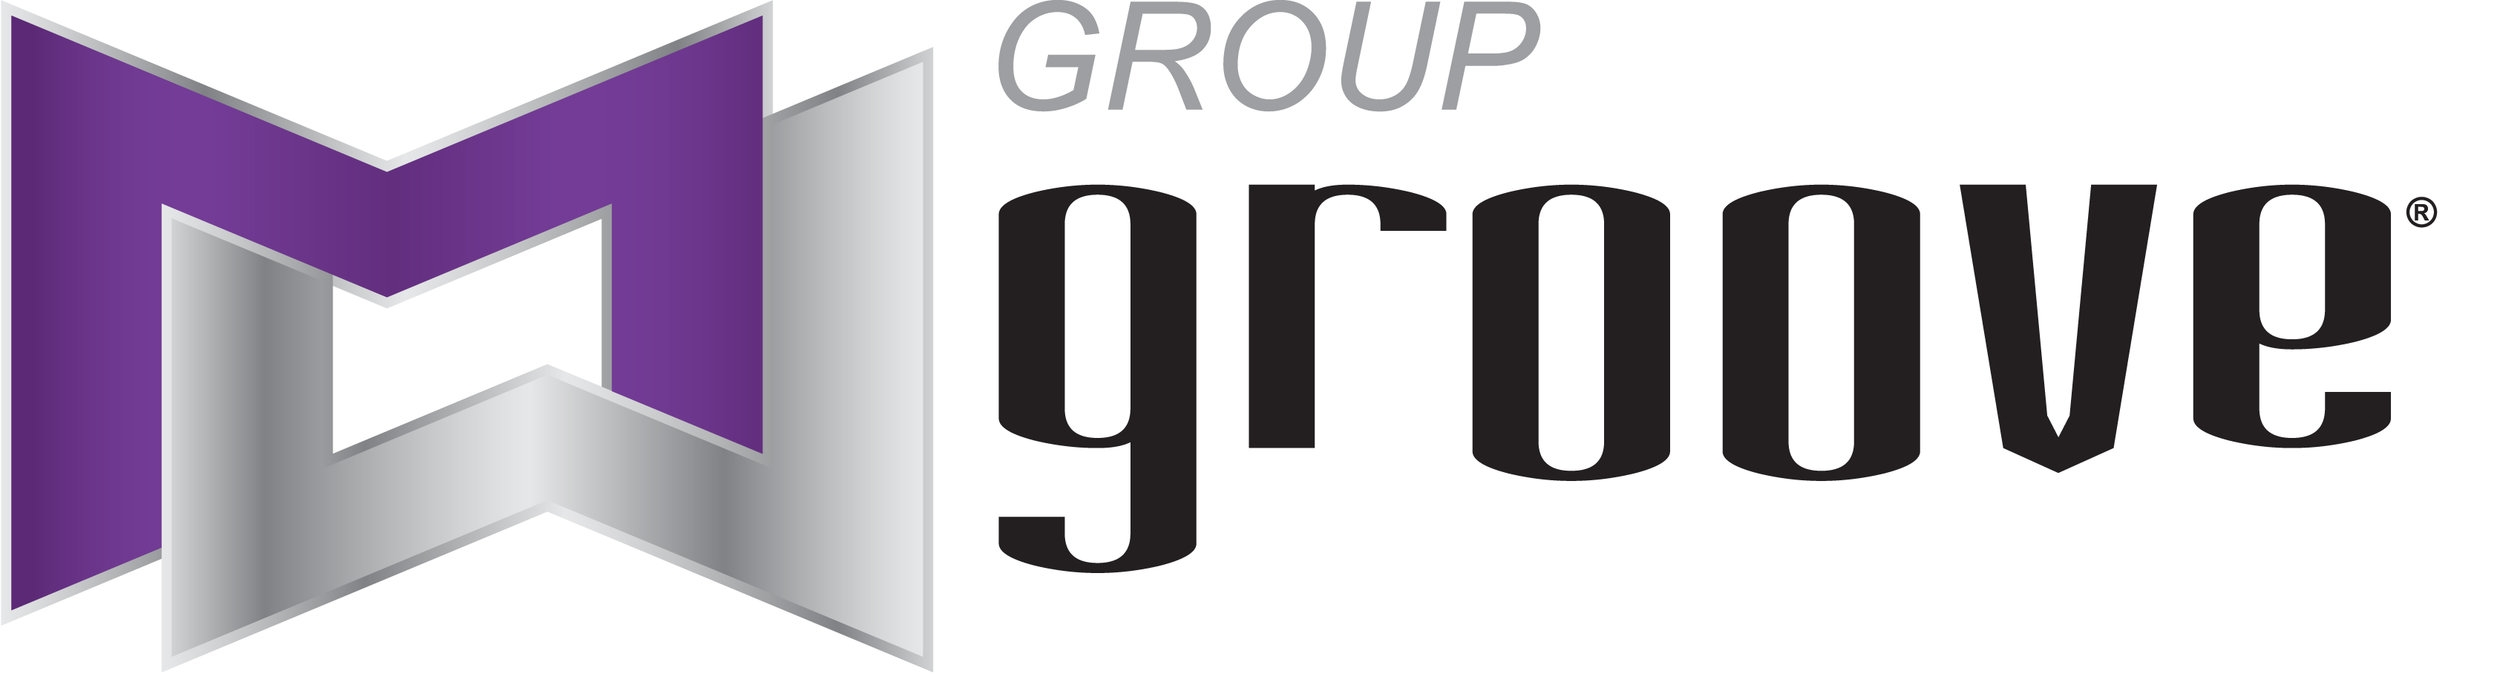 GG-MOSSA-FullLogo-RGB-hires.jpg